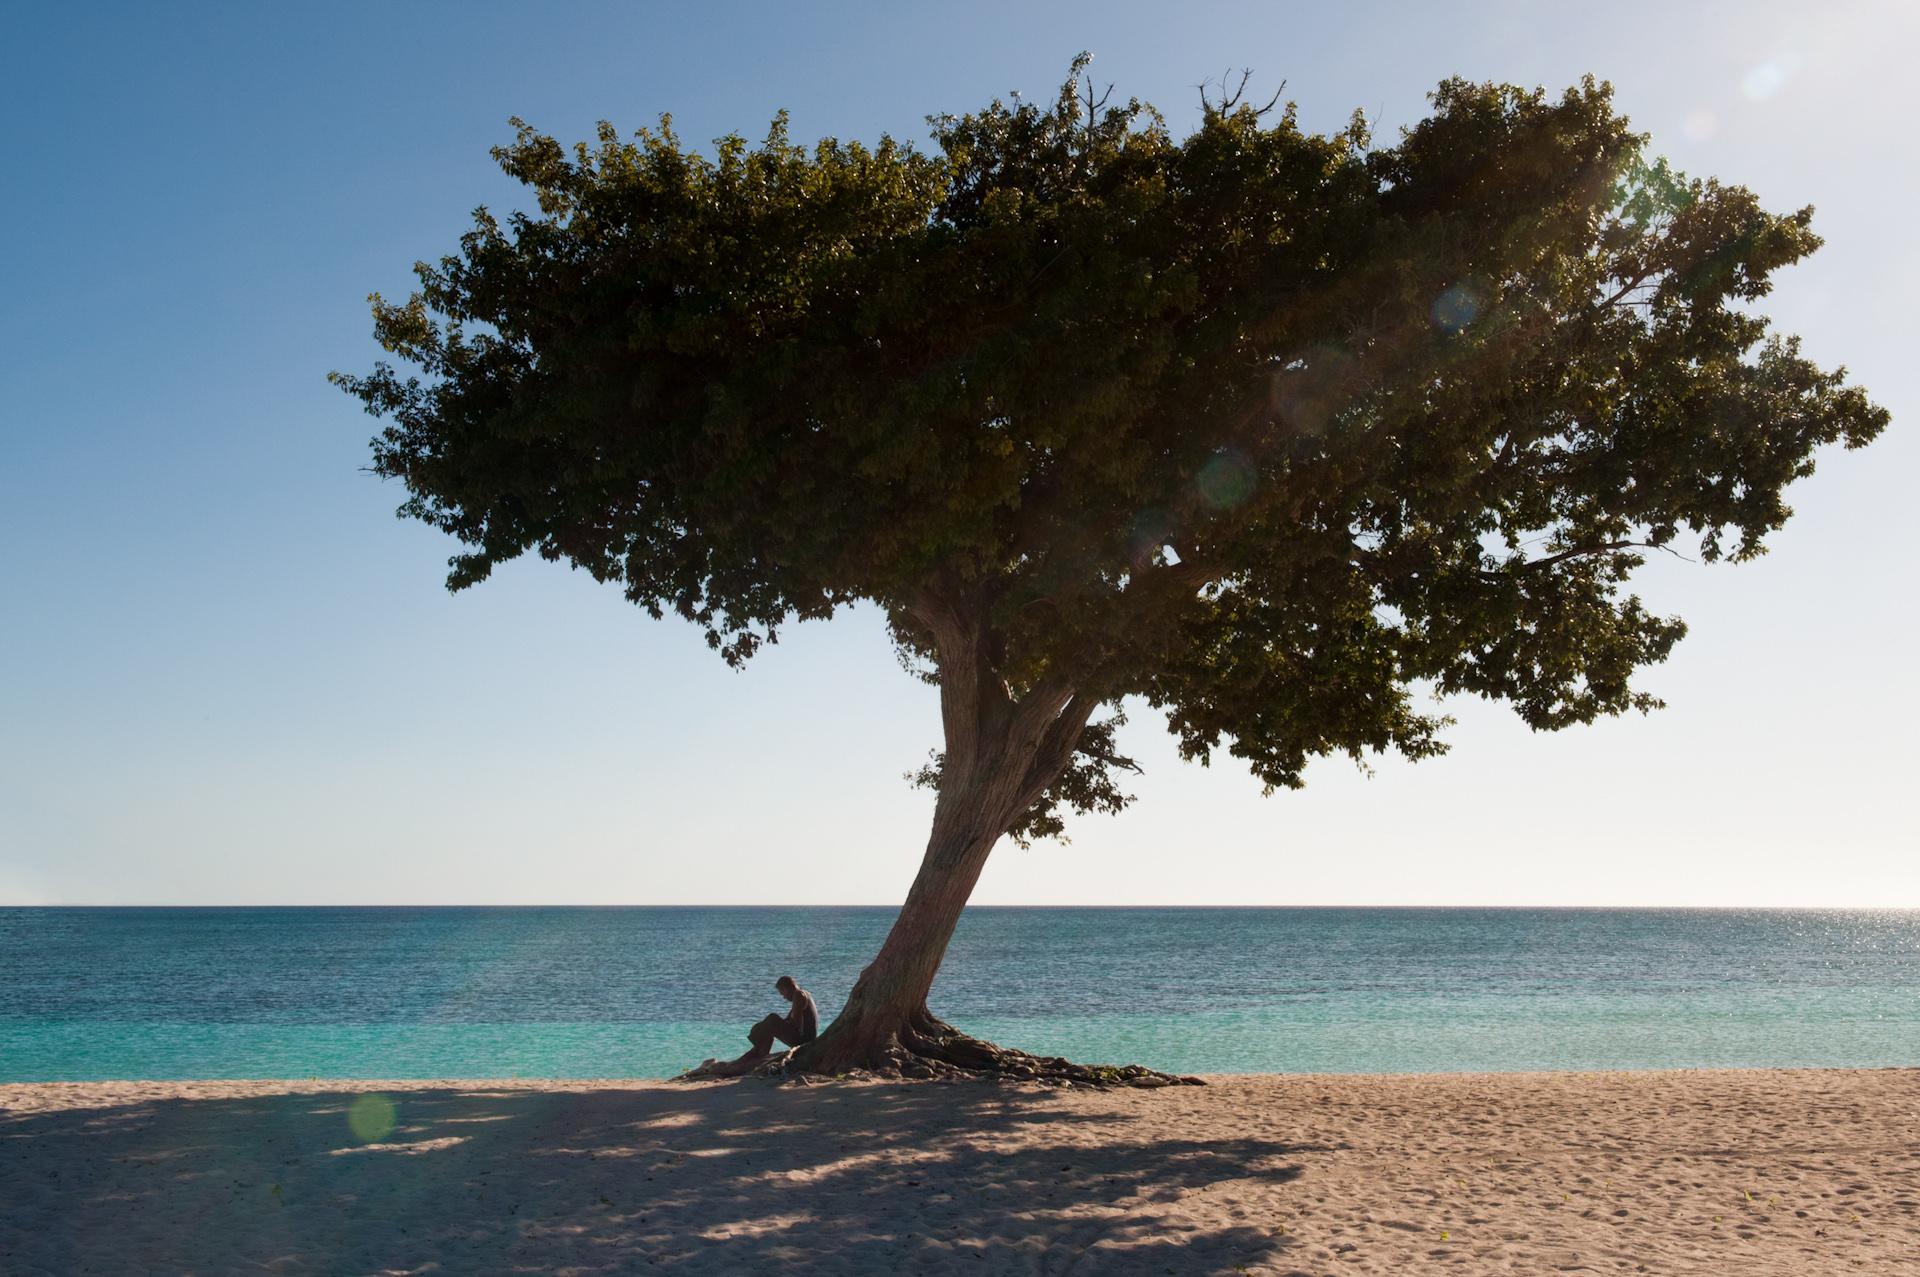 Cuba-Havana-Travel-Trinidad-Beach-Tree.JPG